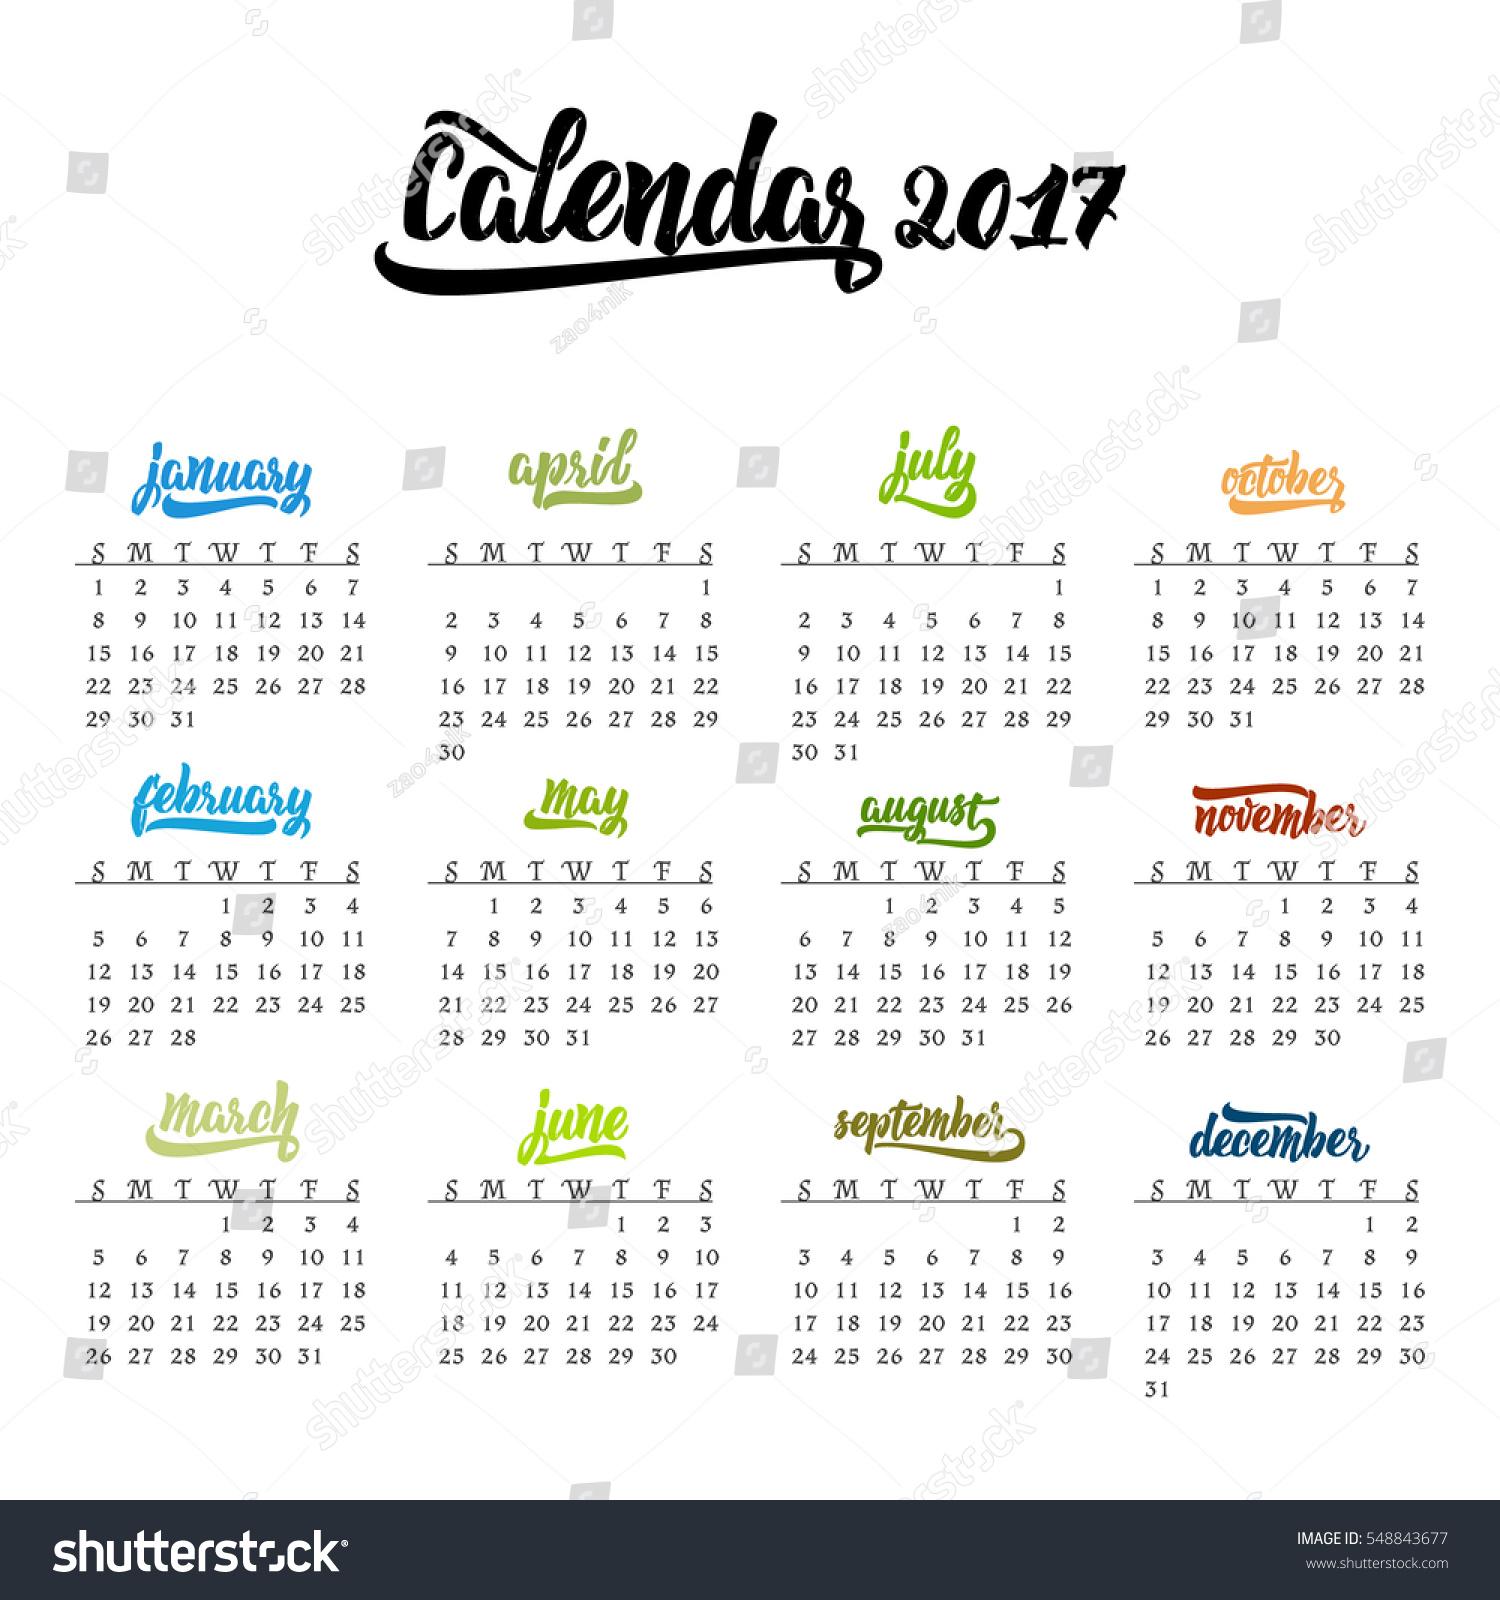 Calendar Year Names : Calendar trendy template handdrawn lettering stock